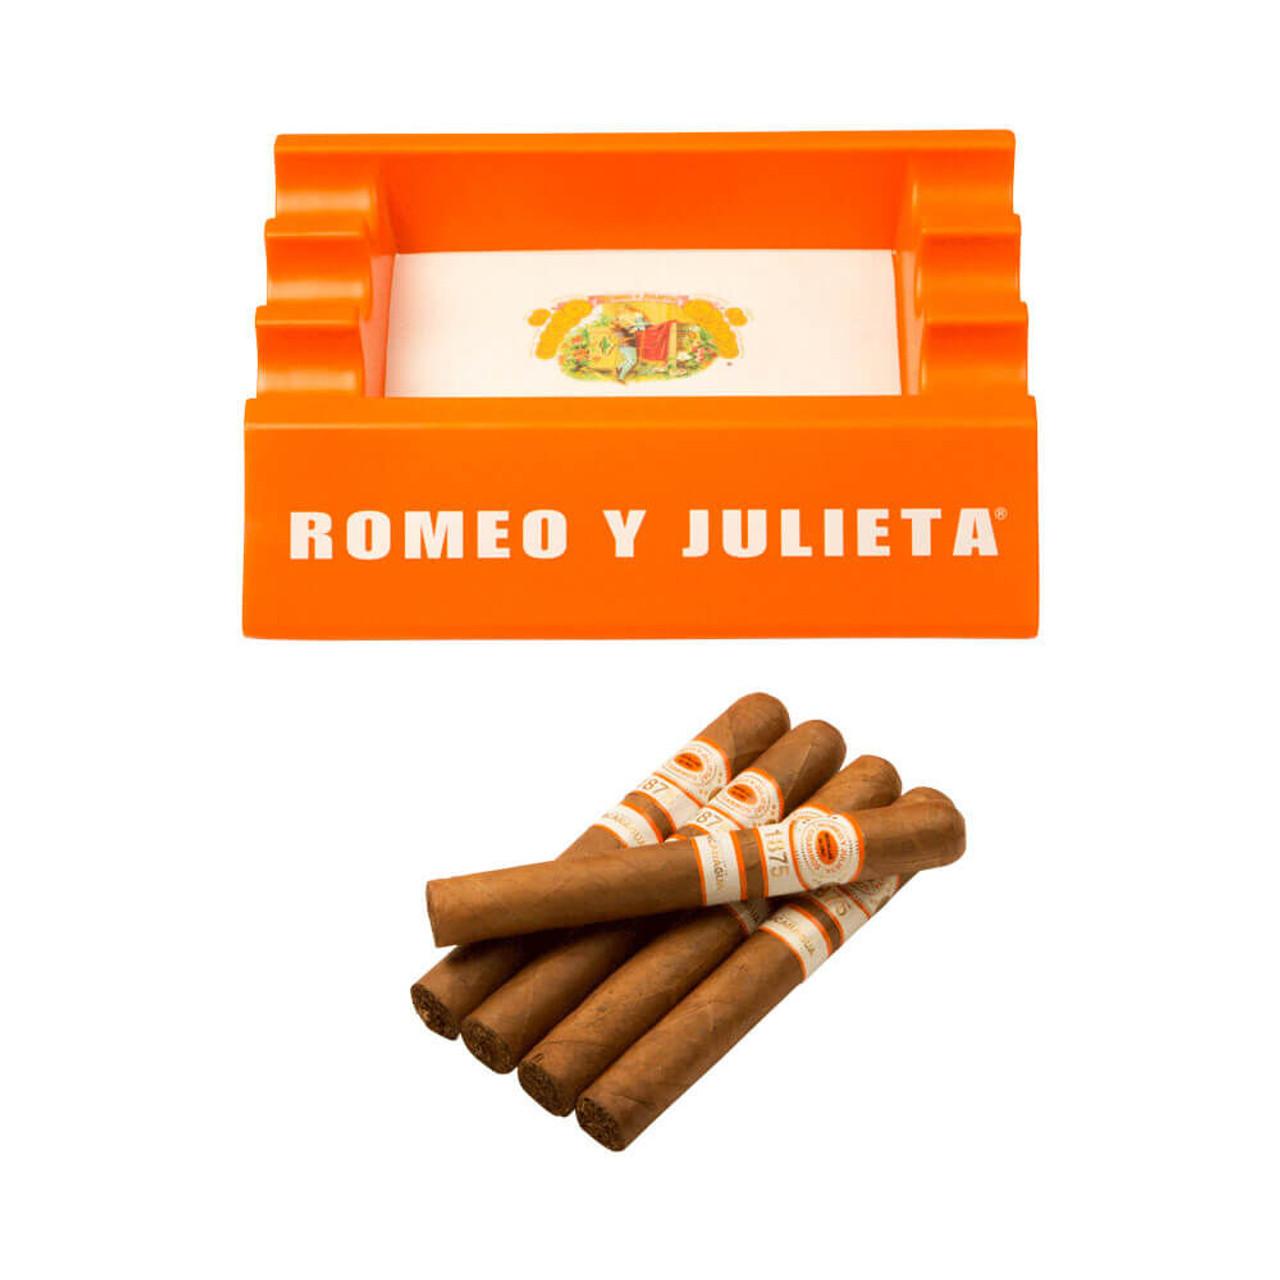 Romeo y Julieta 1875 Nicaragua Toro Cigars and Ashtray